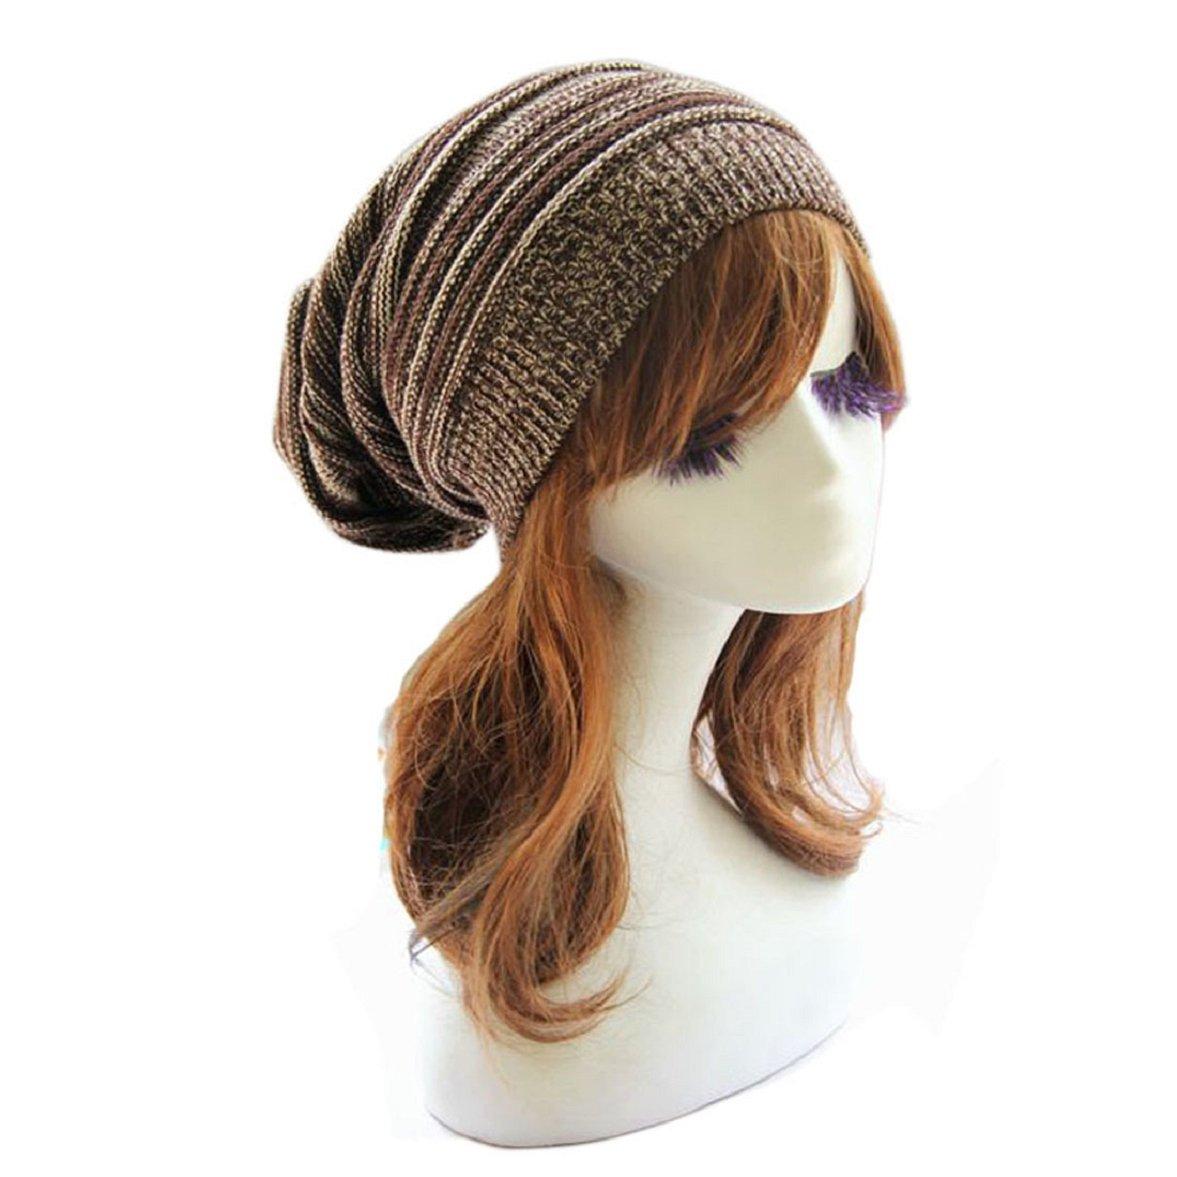 Sandistore Unisex Knit Baggy Beanie Beret Winter Warm Oversized Ski Cap Hat (Coffee)